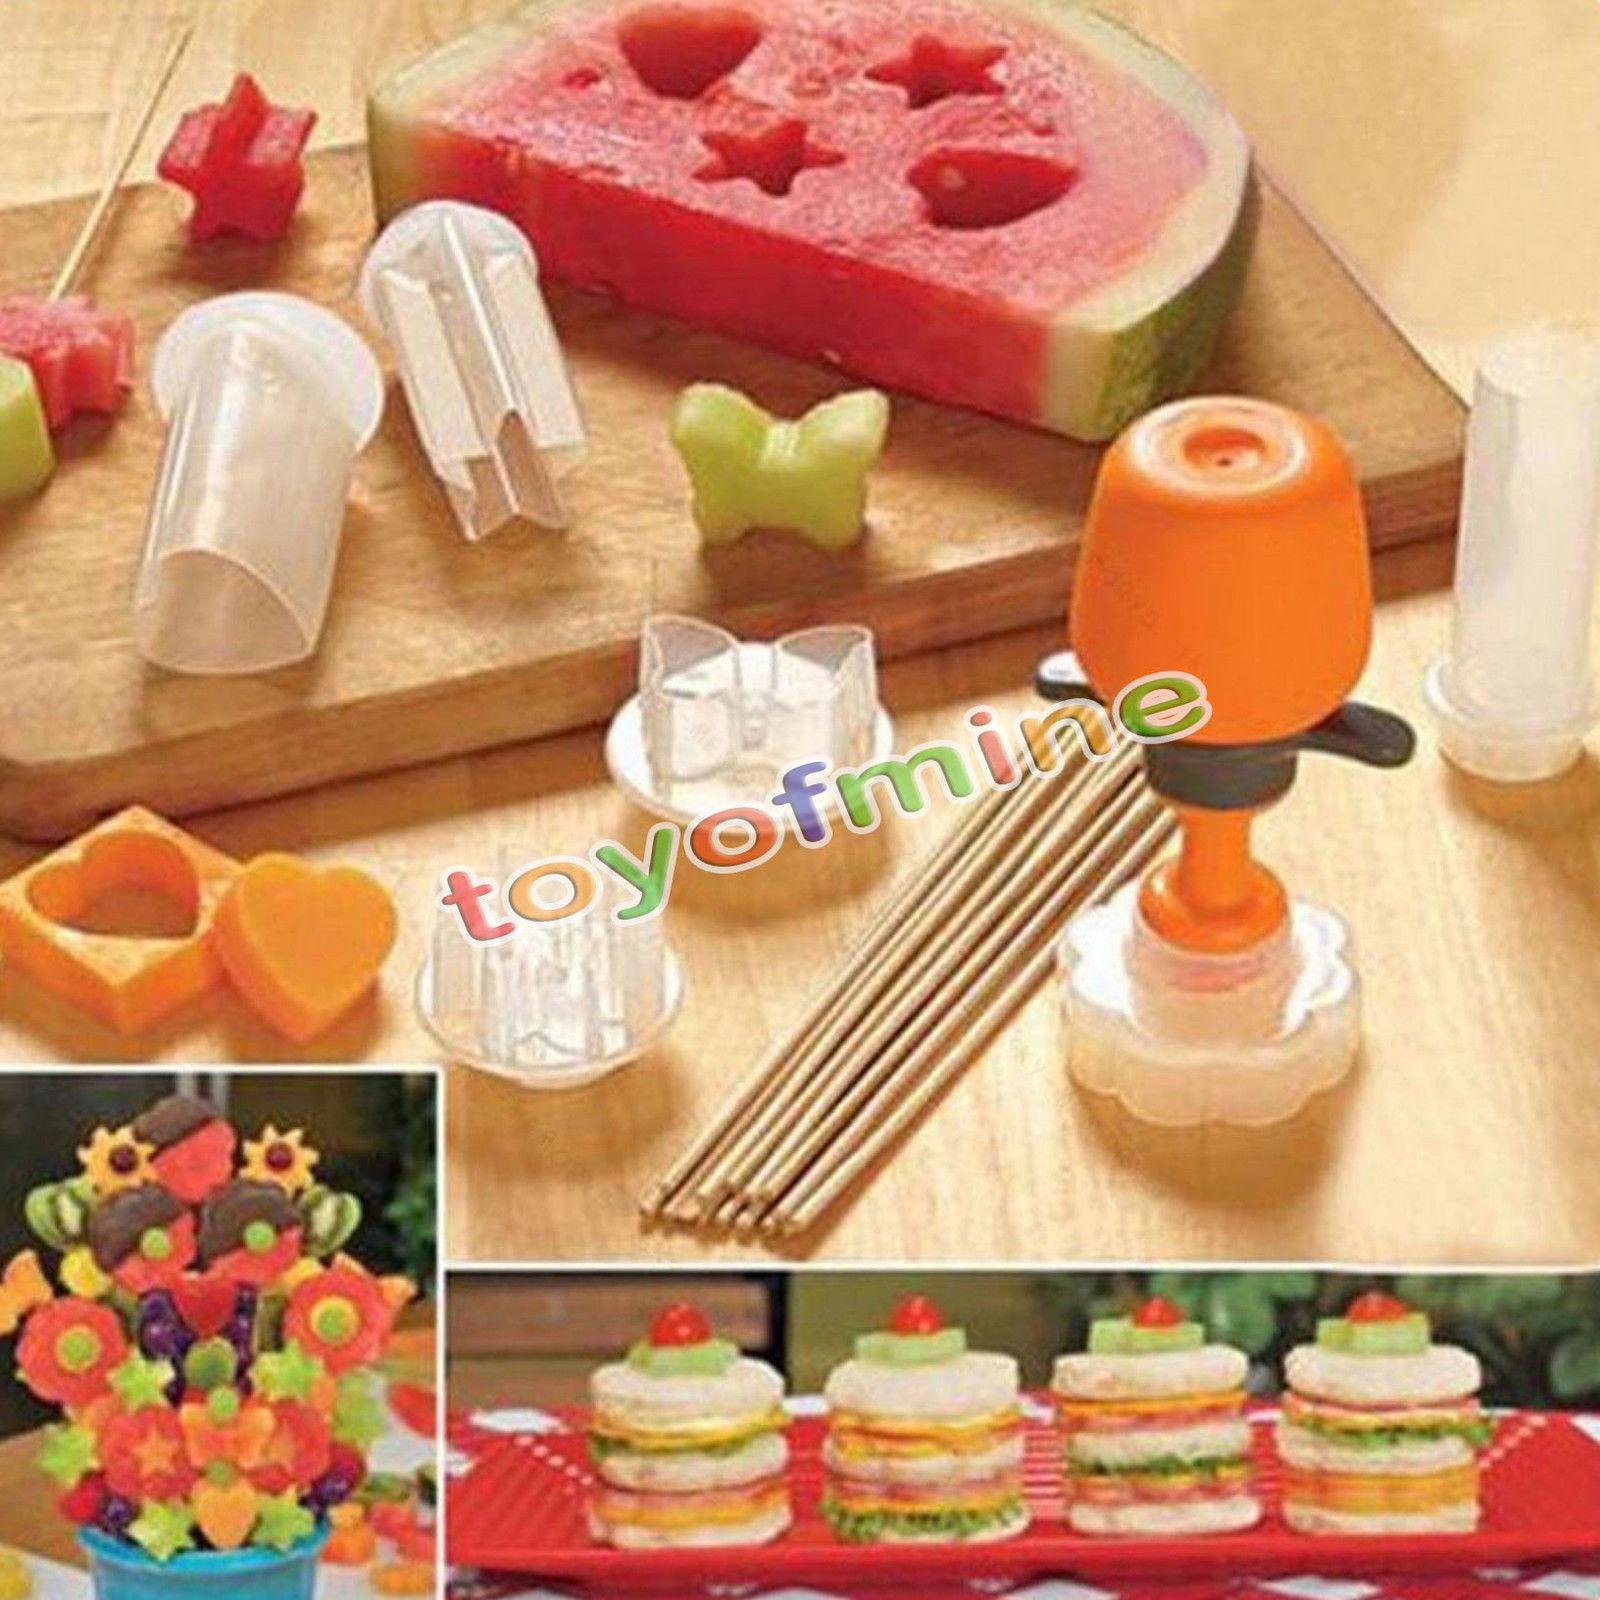 6 Pcs Eco Friendly Fruit Shape Cutter Slicer Food Decorator Fruit Cake  Salad Helper Kitchen Accessories Cooking Tools Heart Star